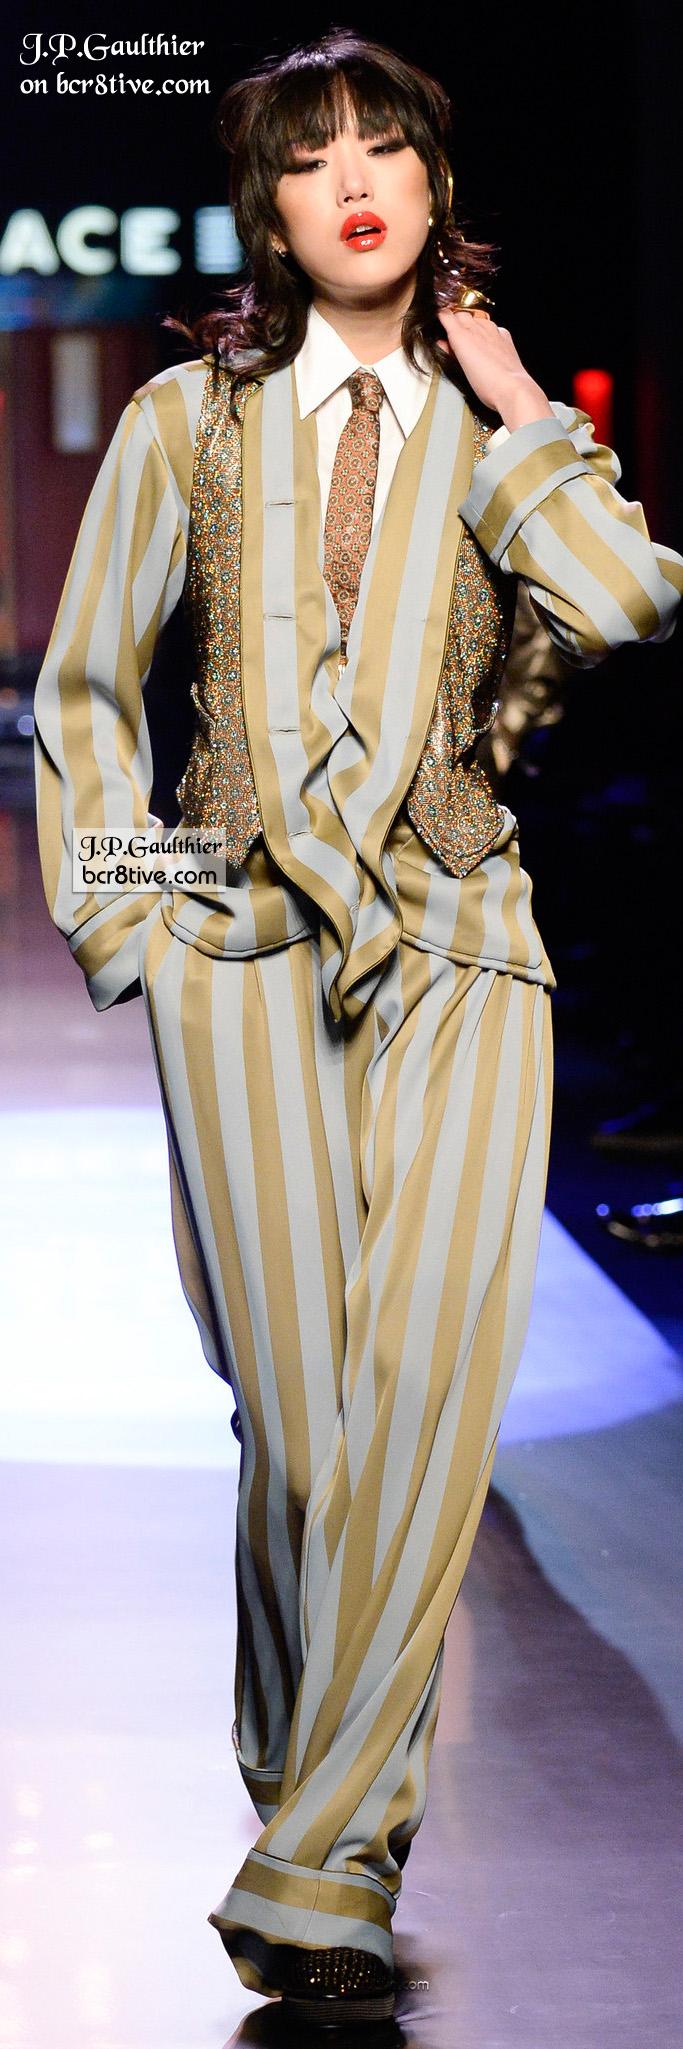 Jean Paul Gaultier Spring 2016 Haute Couture